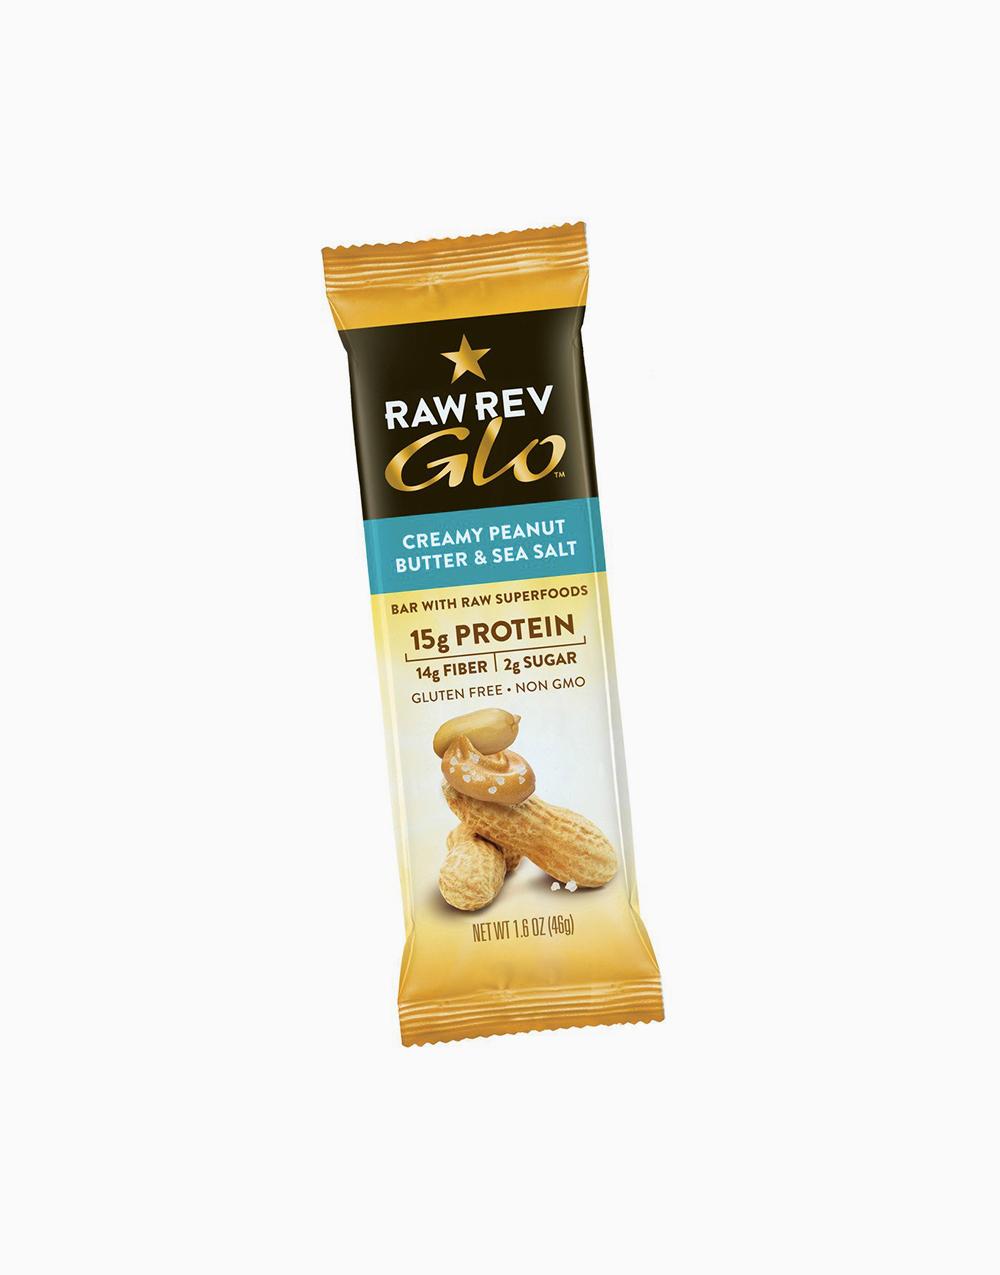 Creamy Peanut Butter & Sea Salt (46g) by Raw Rev Glo